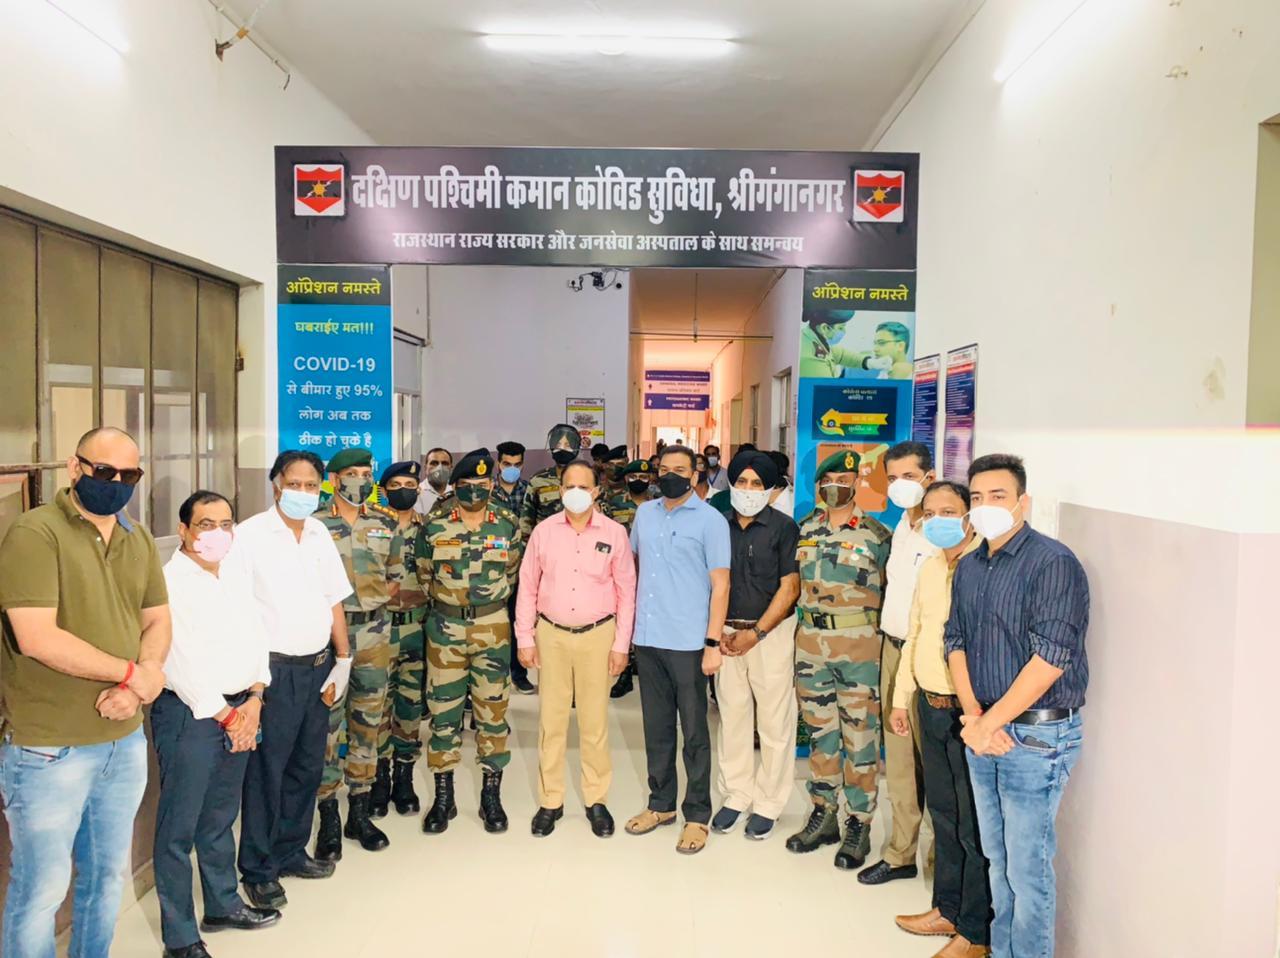 INDIAN ARMY DEDICATES 50 BED COVID FACILTY IN SRIGANGANAGAR